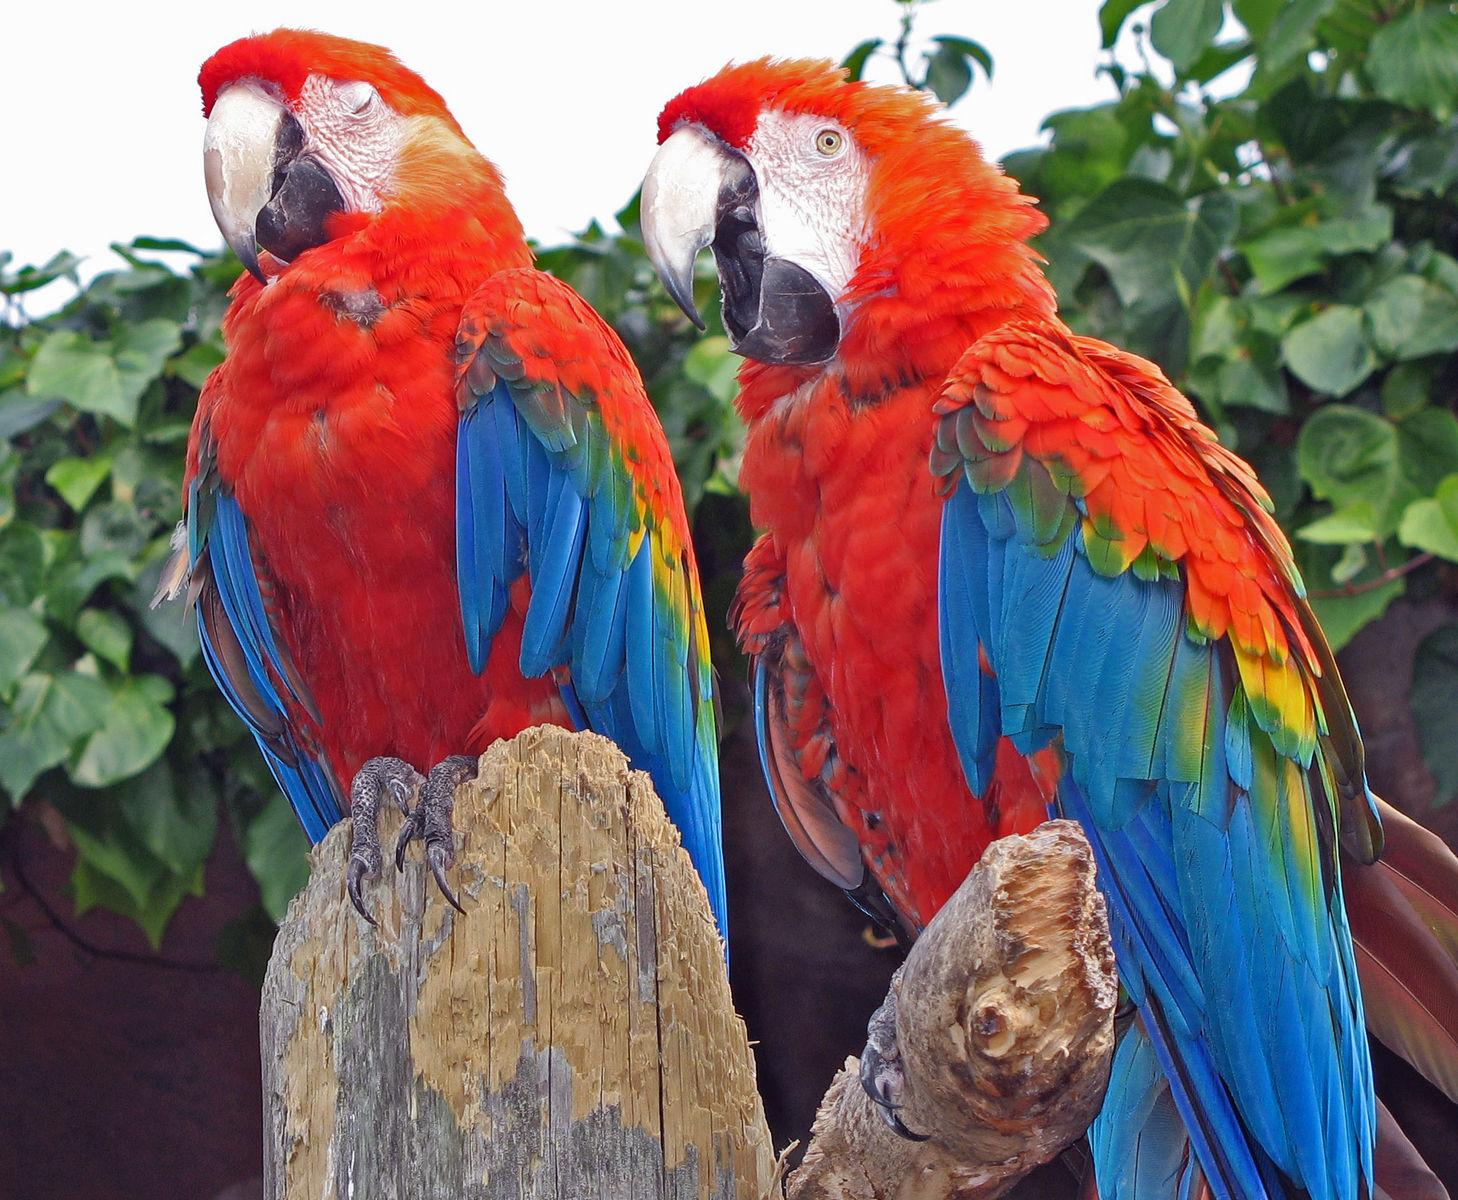 beautiful parrots wild birds wild life